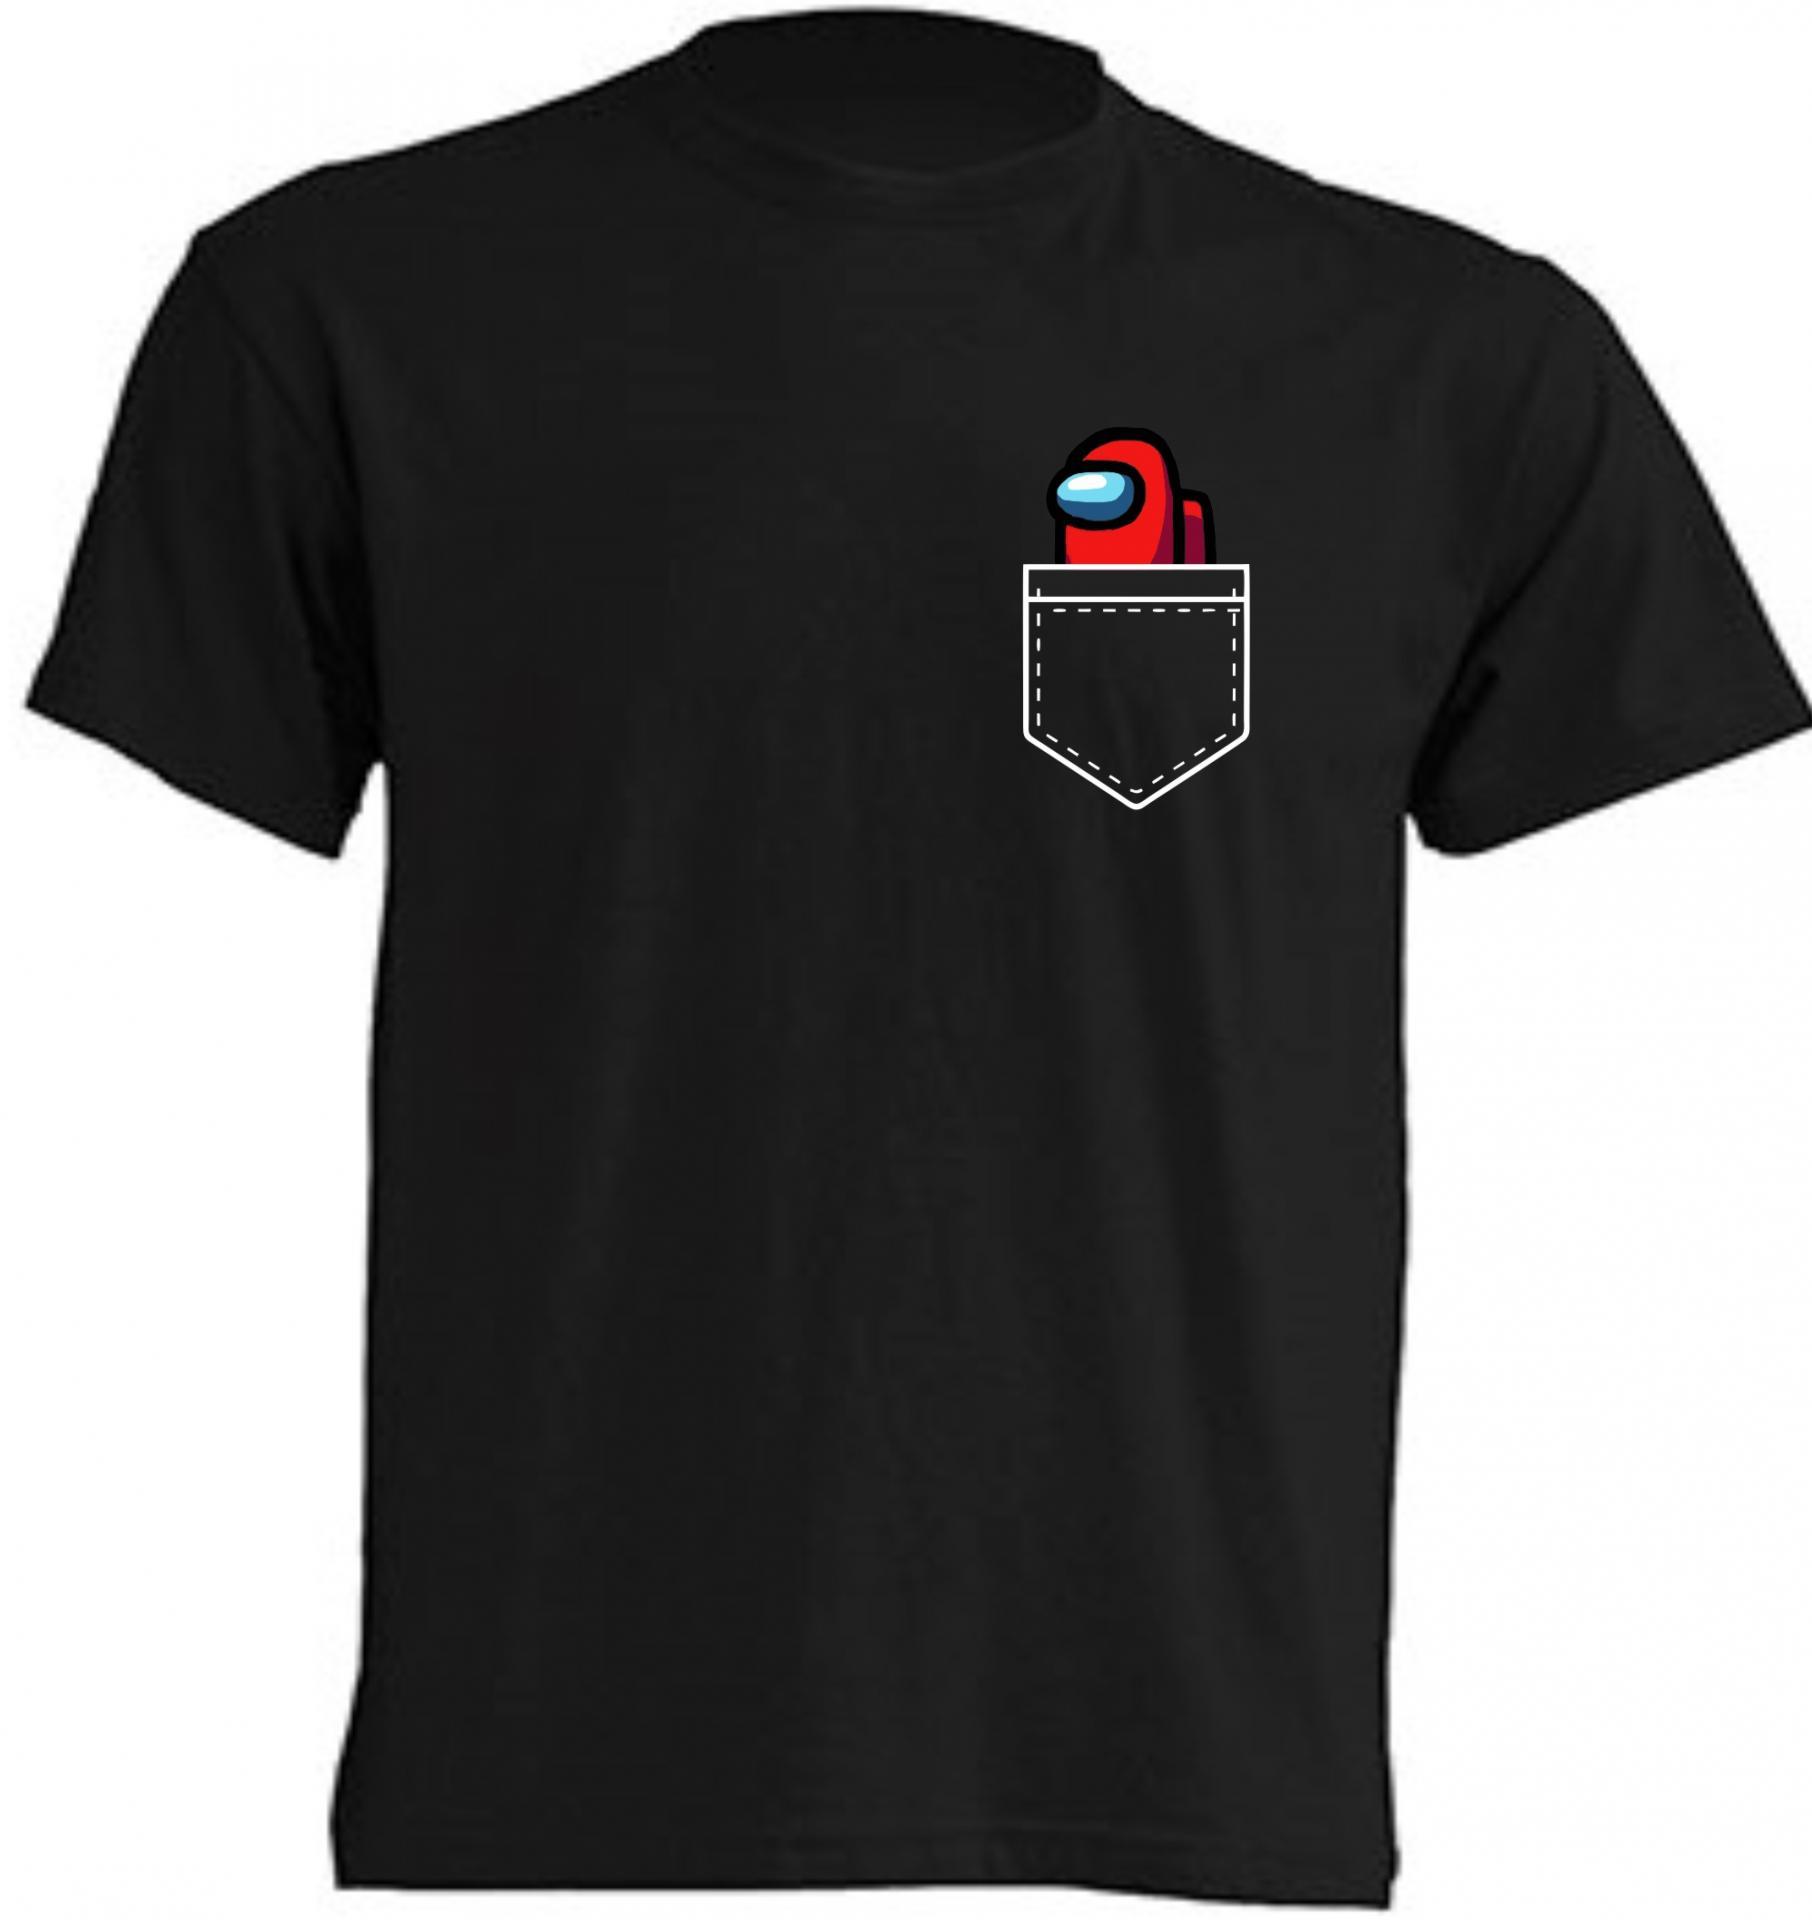 Camiseta Among Us bolsillo